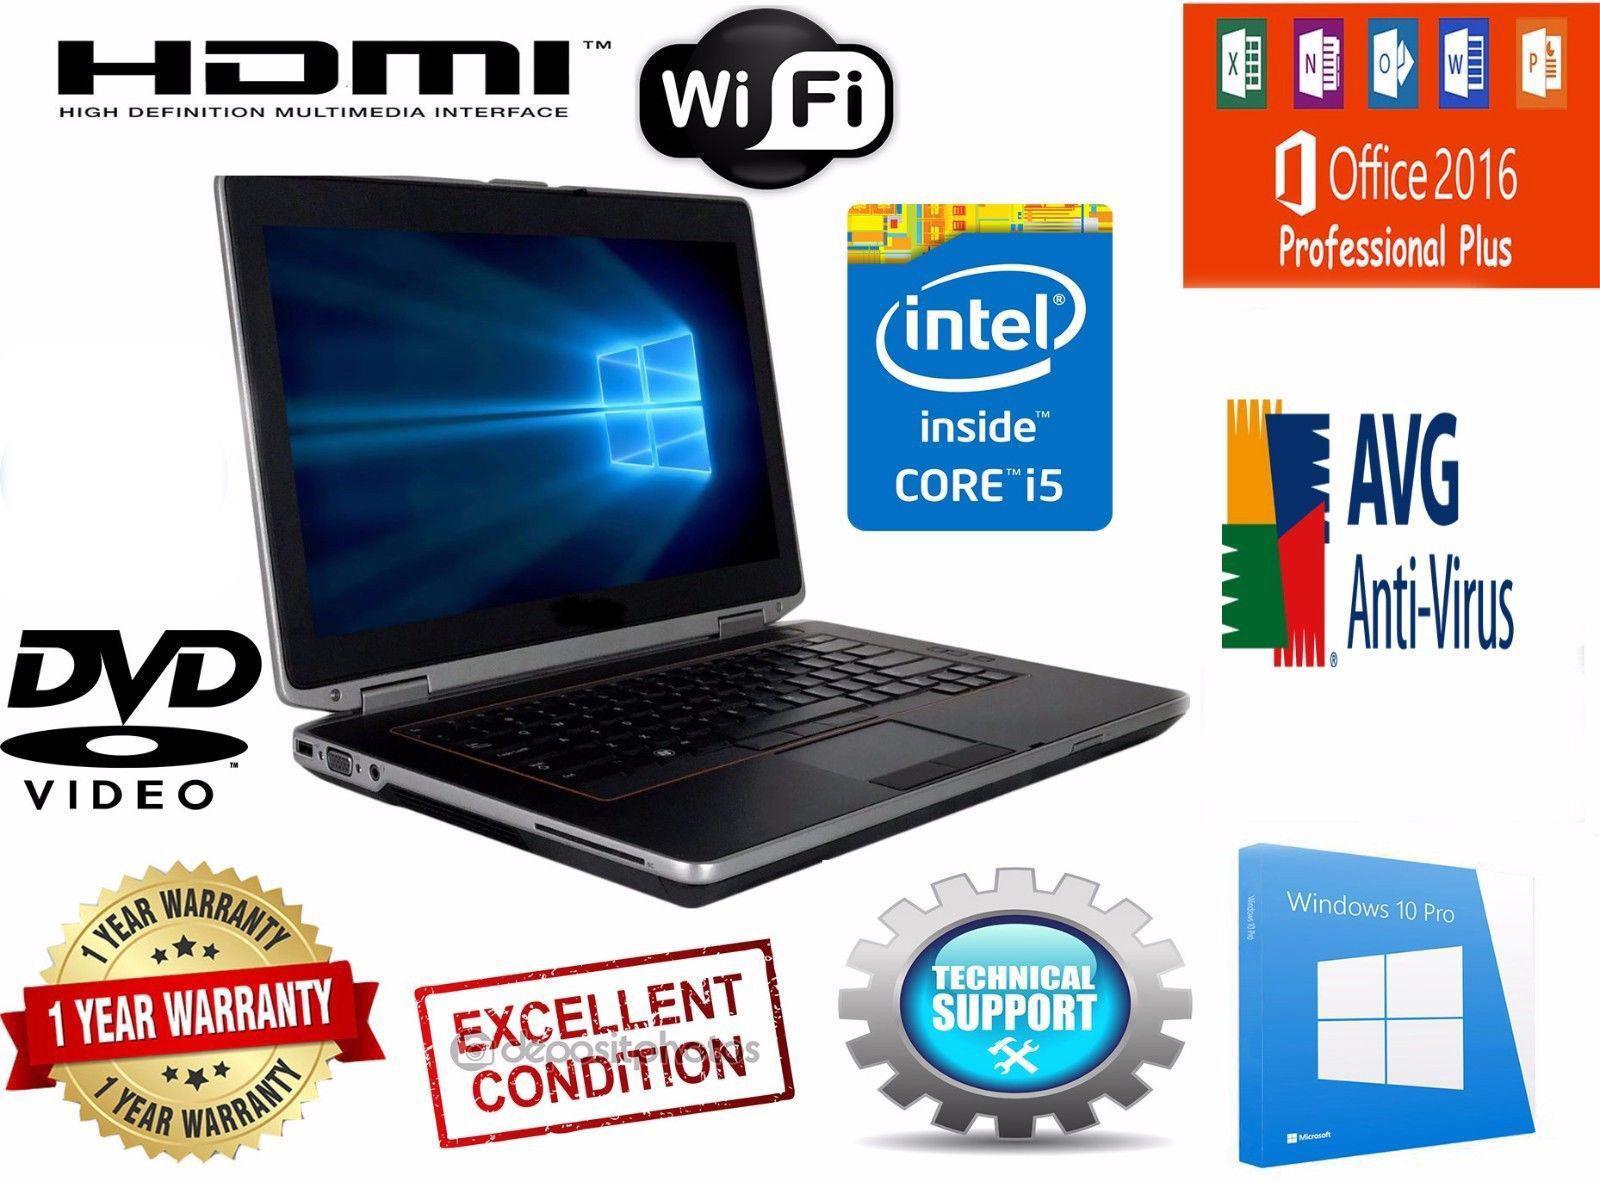 Laptop Windows - DELL LATITUDE Laptop Computer PC CORE I5 Windows PRO 500GB WiFi DVD NOTEBOOK HD